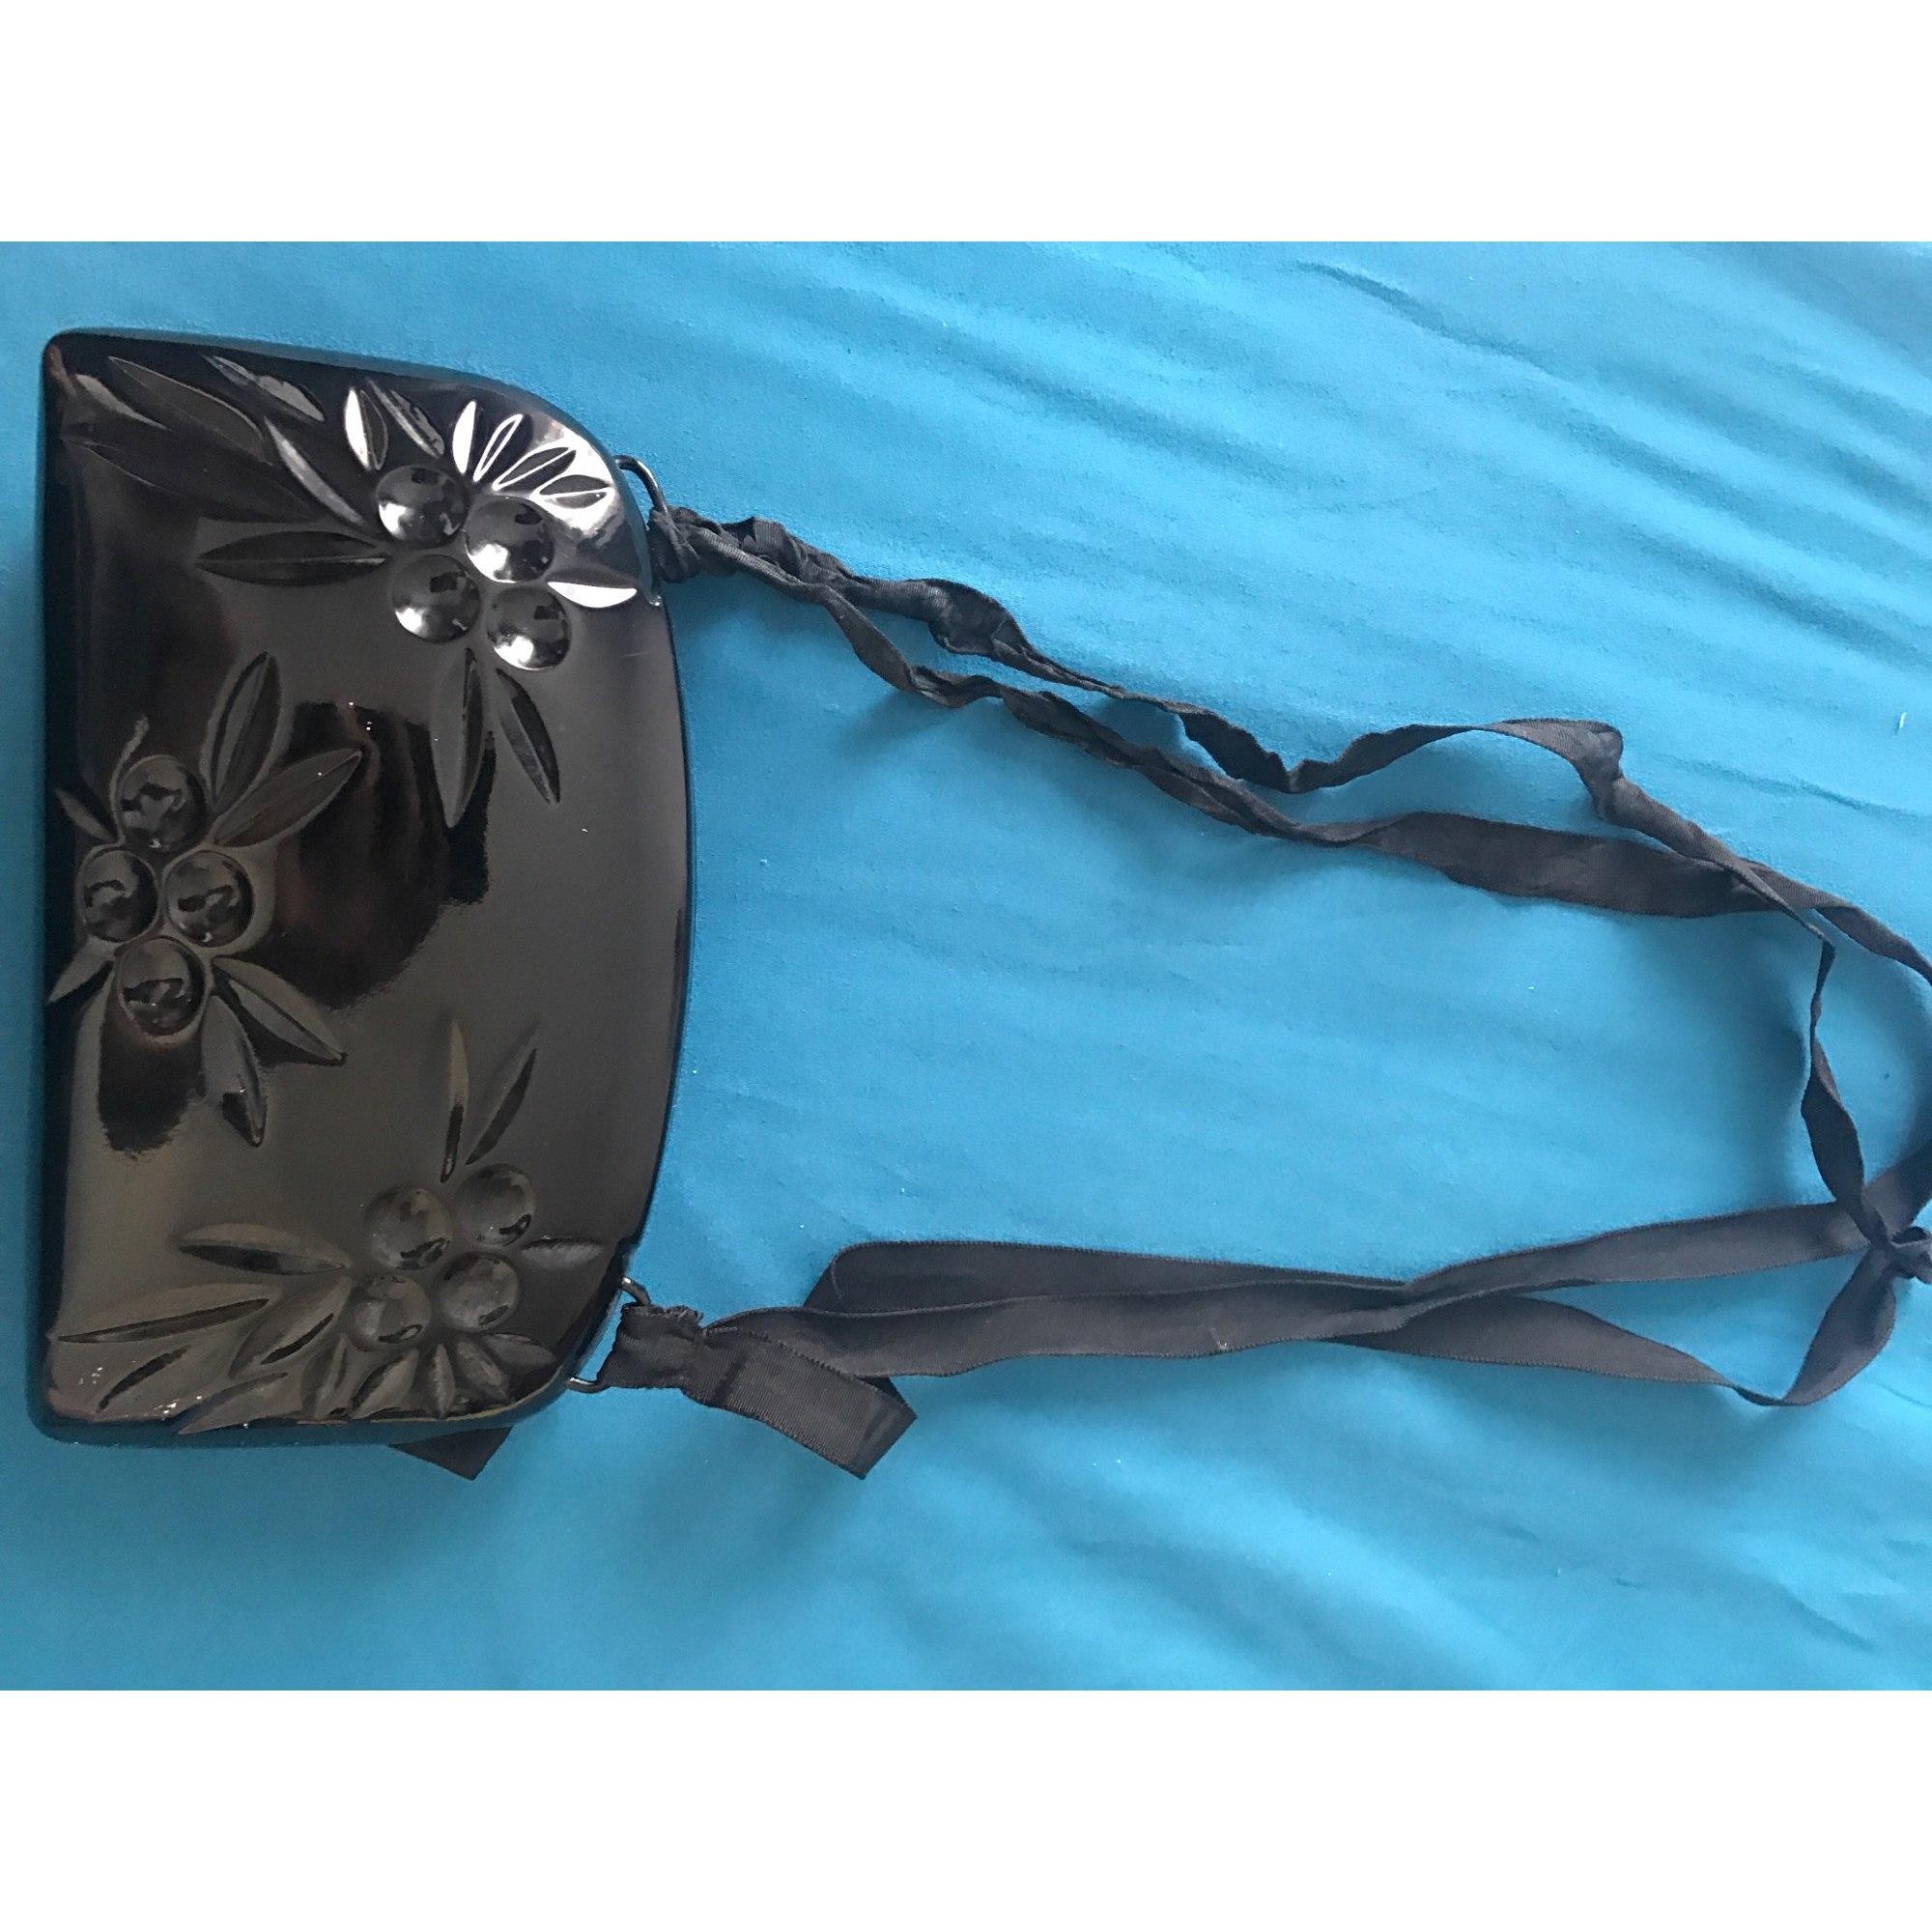 Pochette KENZO plastique noir